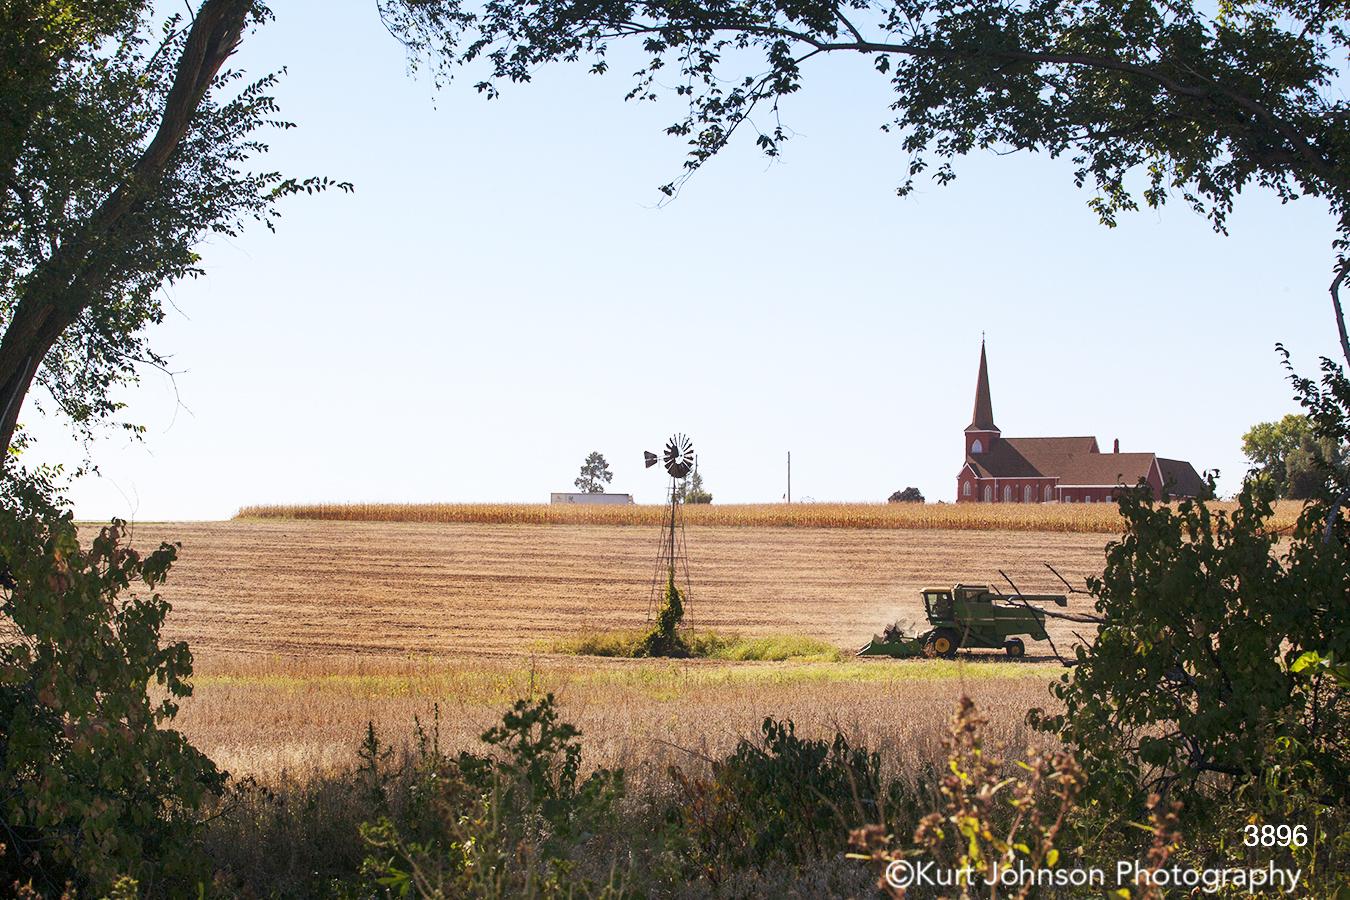 landscape windmill church rural midwest field harvest